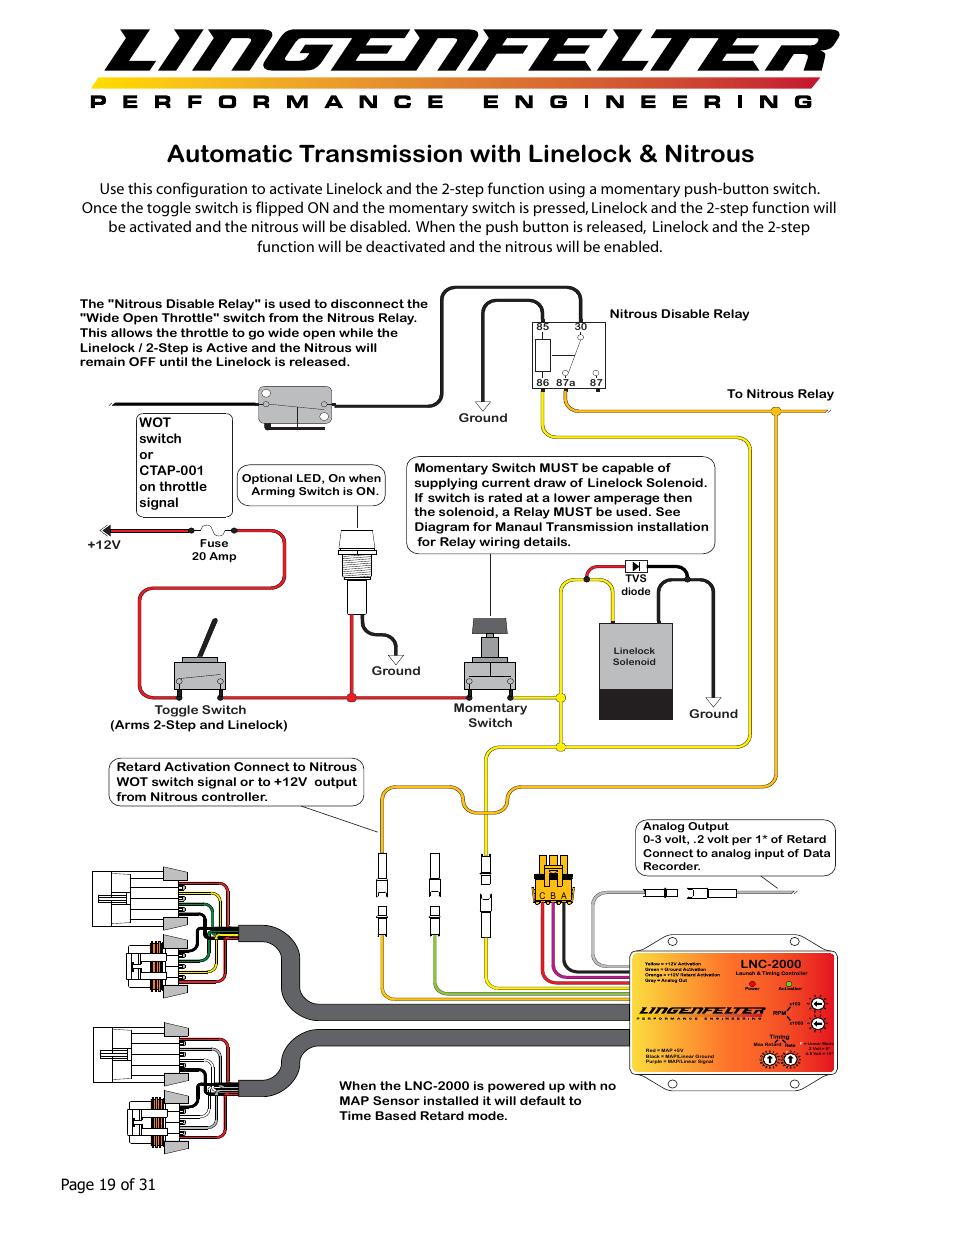 nos relay wiring diagram trusted wiring diagram rh dafpods co Mini Nos Wiring-Diagram MSD 7Al 3 Wiring Diagram